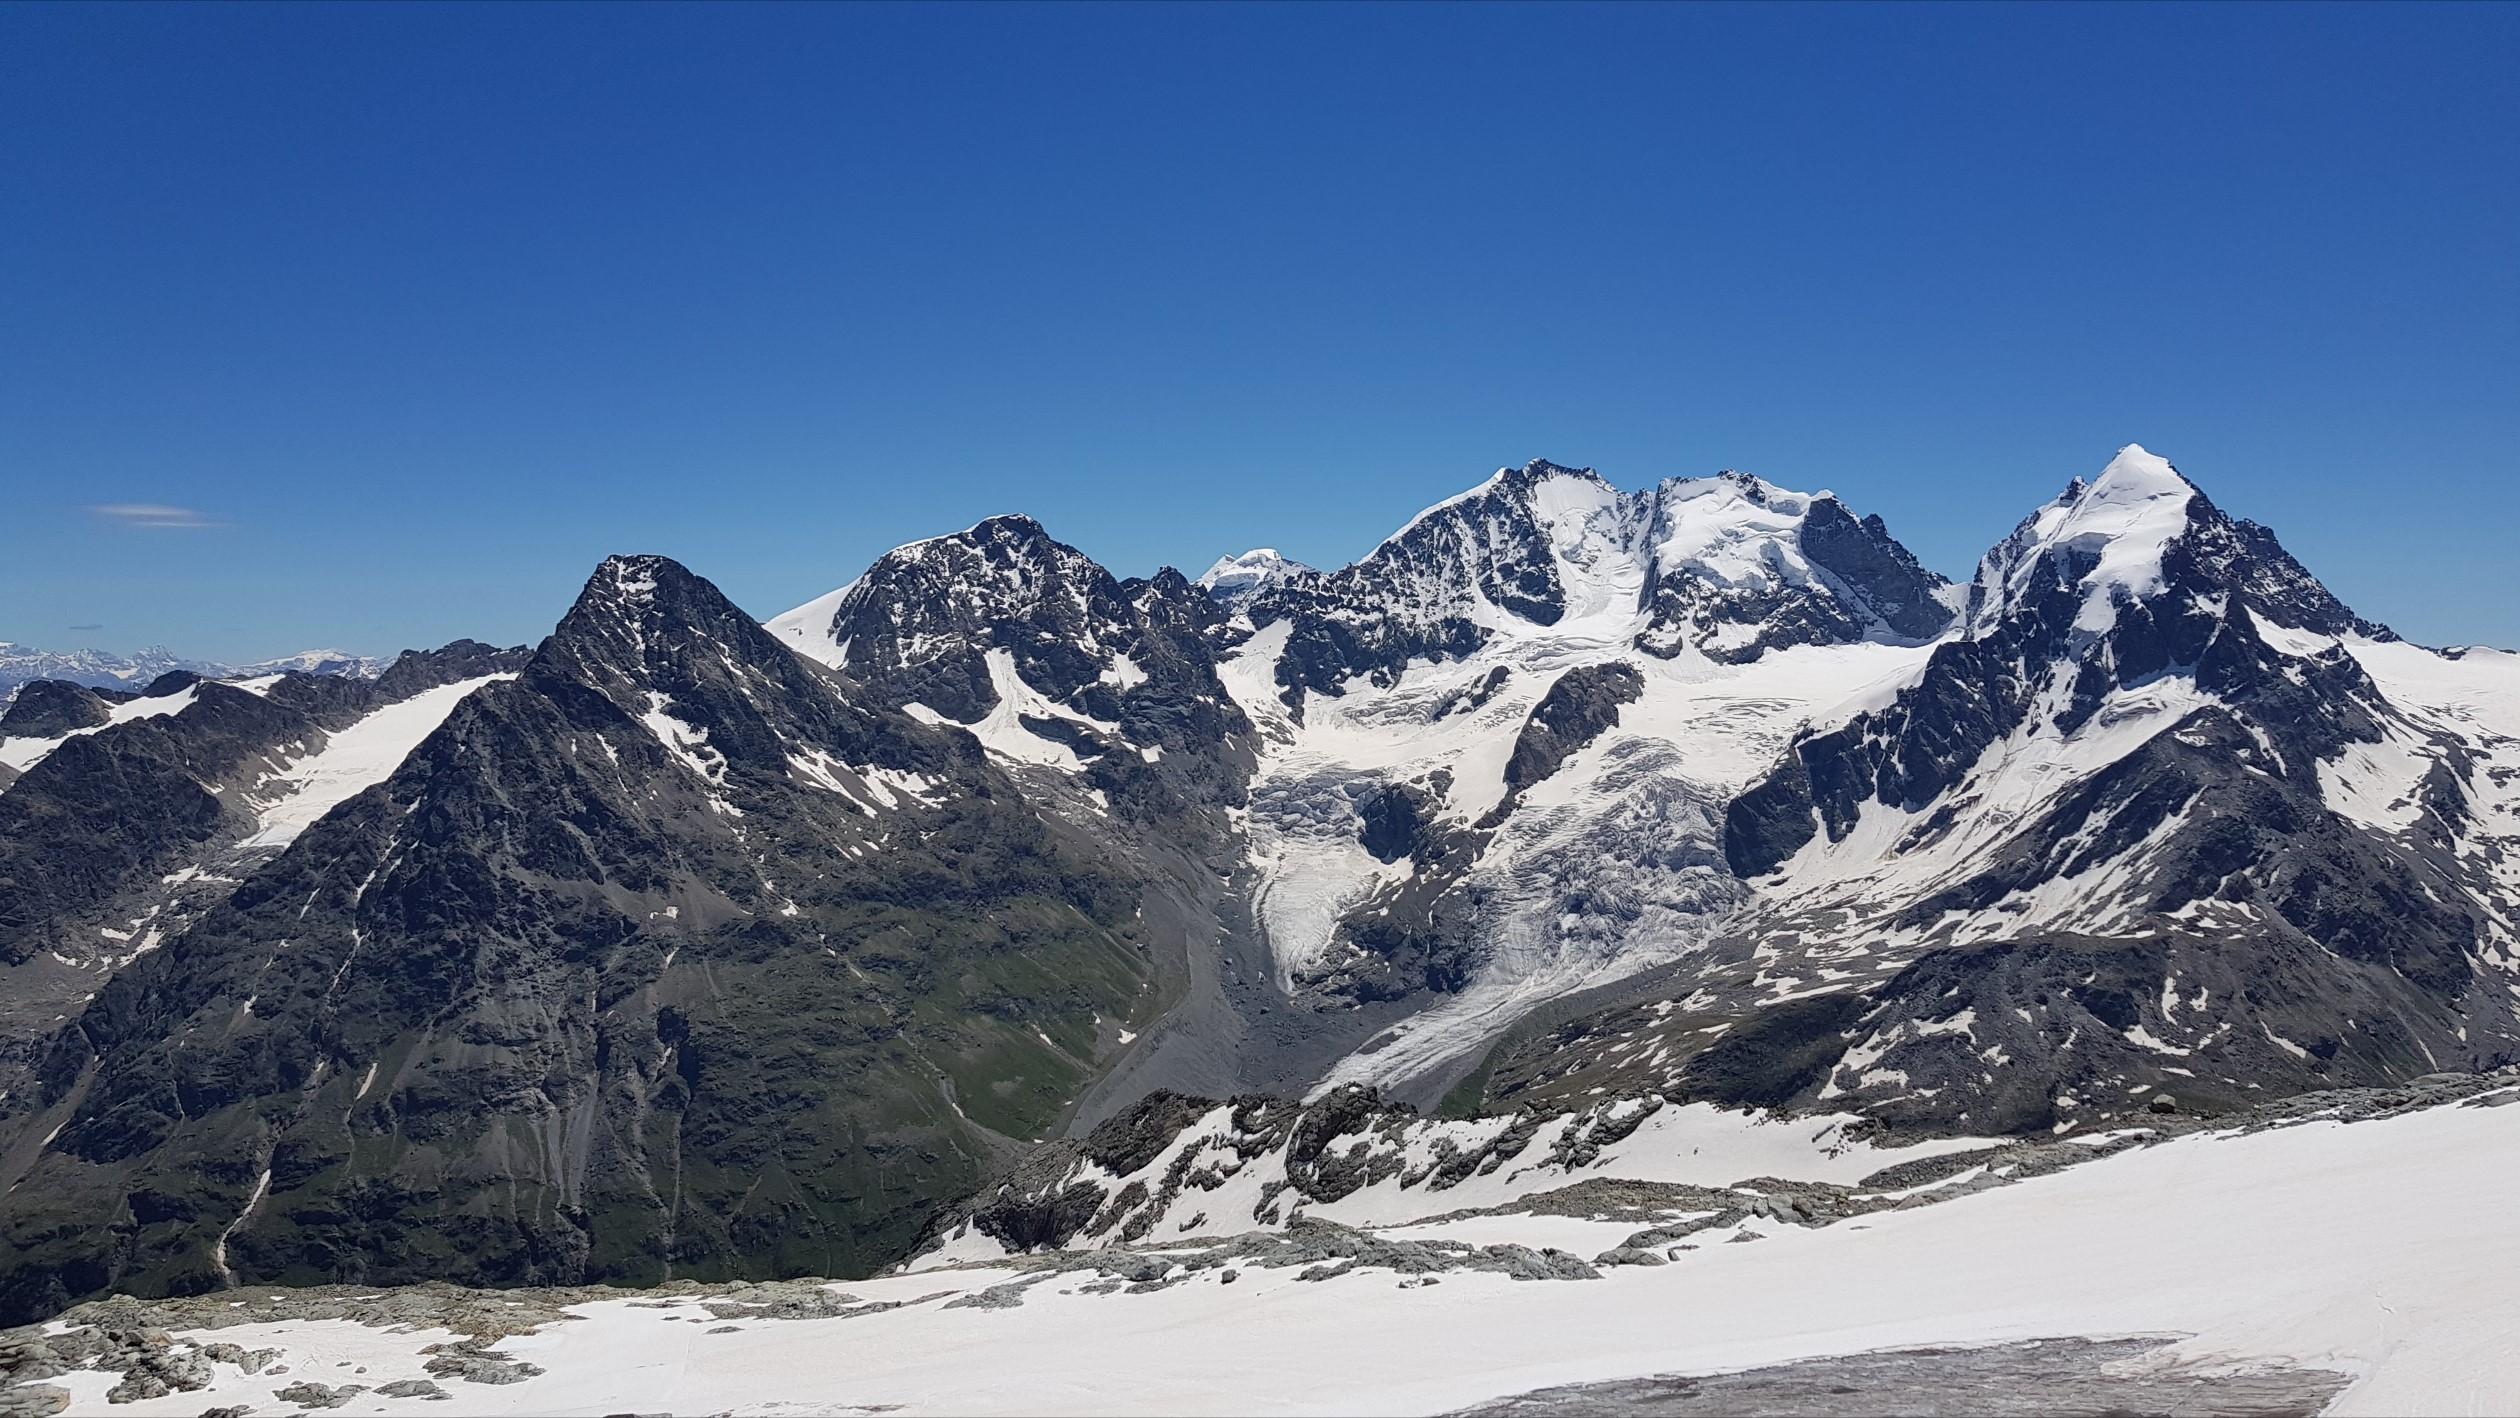 Engadine, Silvaplana, Corvatsch, view on Piz Tschierva, Piz Bernina